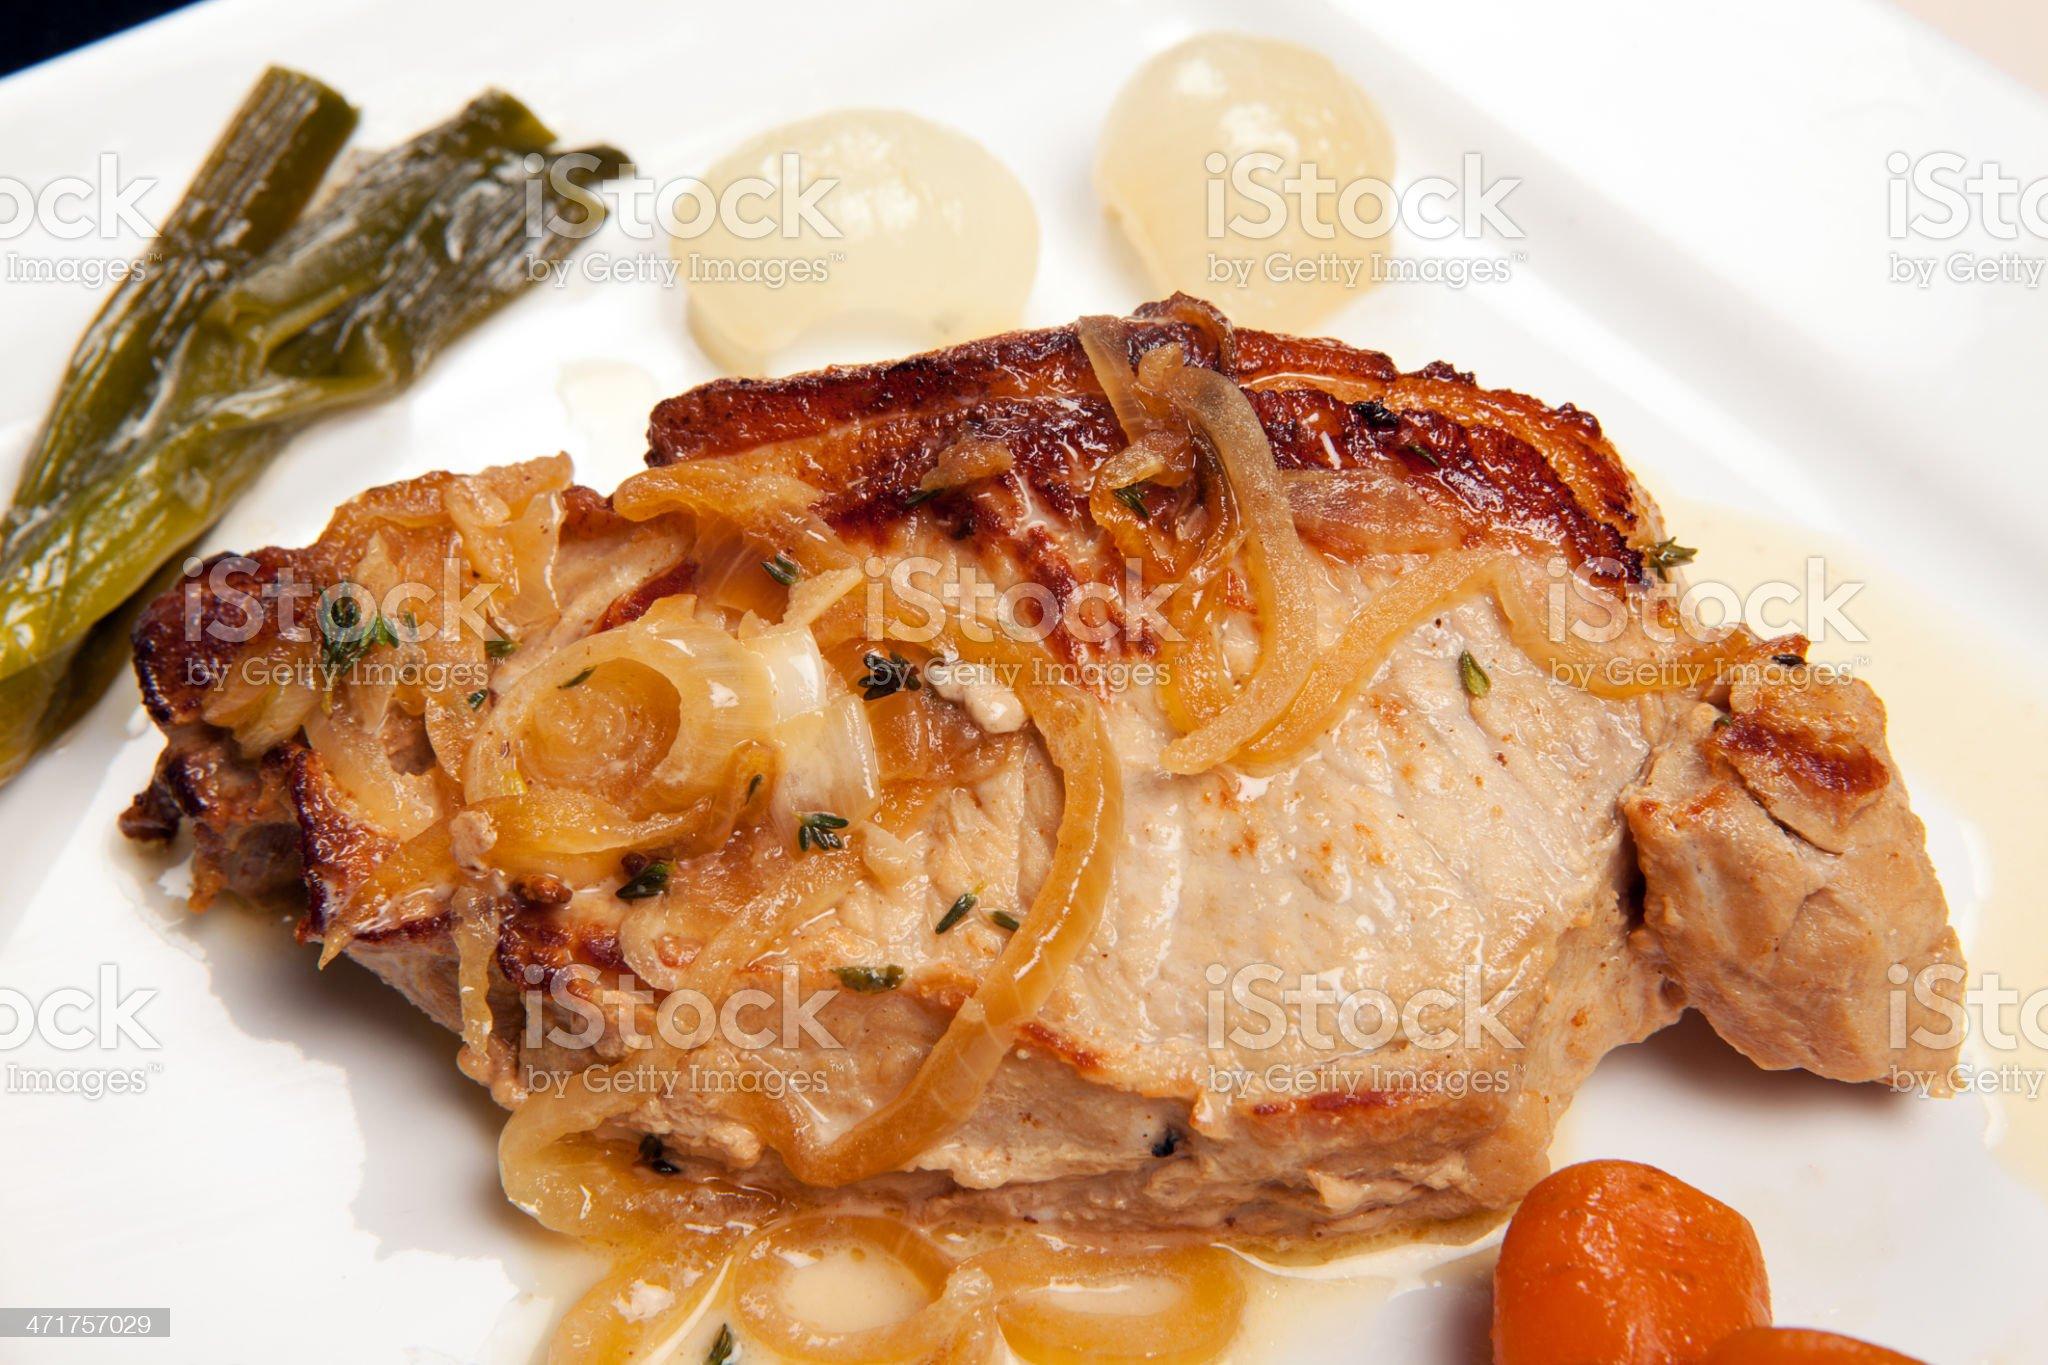 pork chop dish vegetables royalty-free stock photo